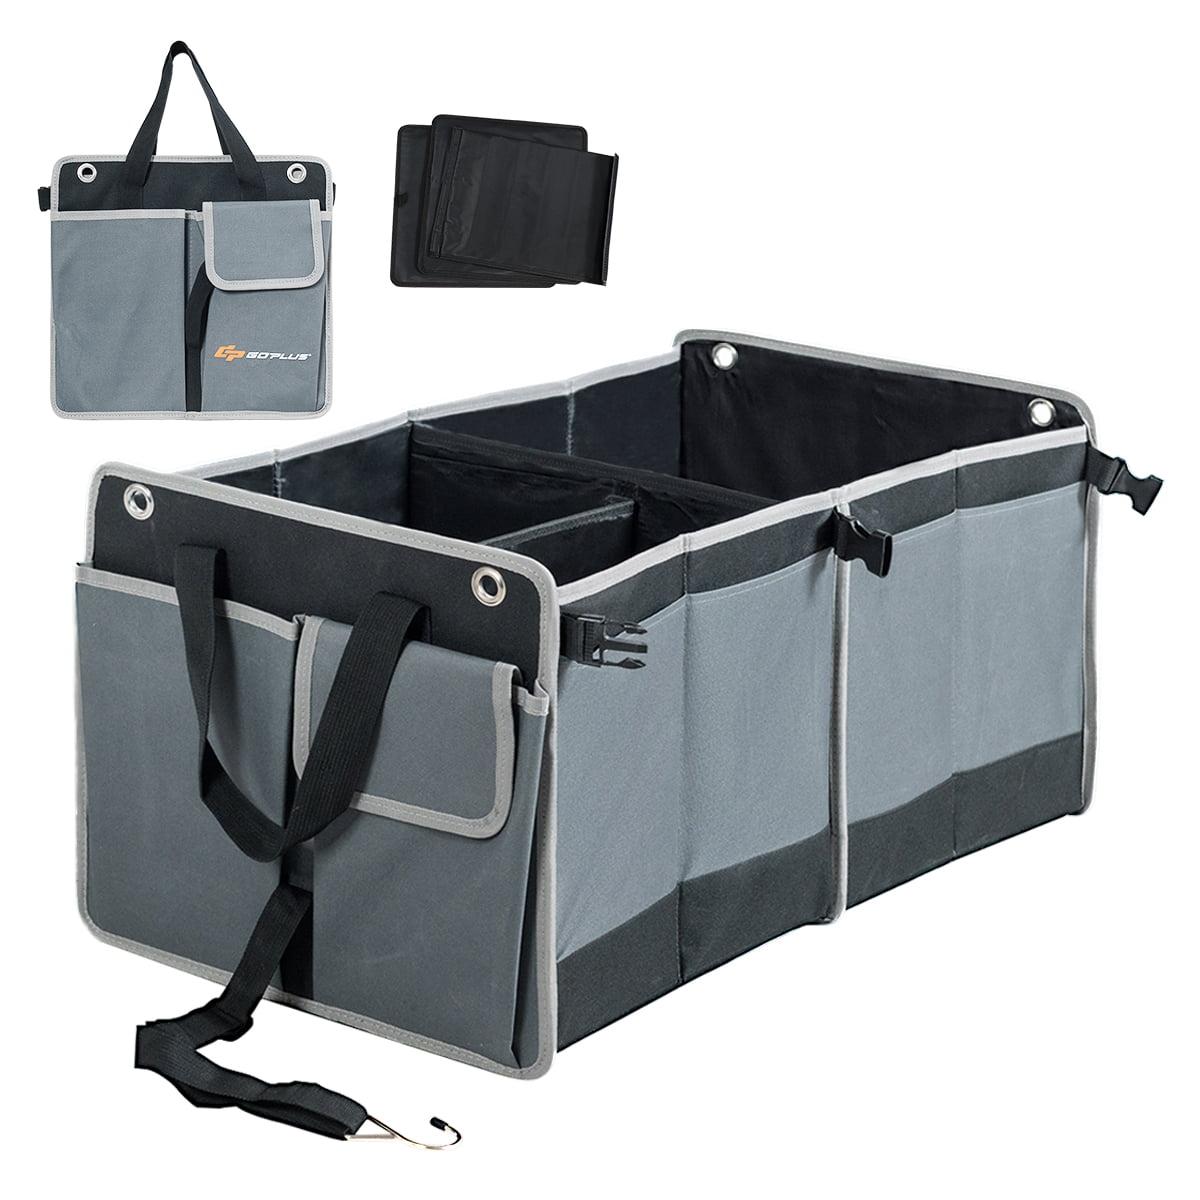 Auto Sport Folding Trunk Organizer Oxford Cloth Car Storage Bag Compartment Foldable Pockets Portable Cargo Carrier Accessries fit NO Logo